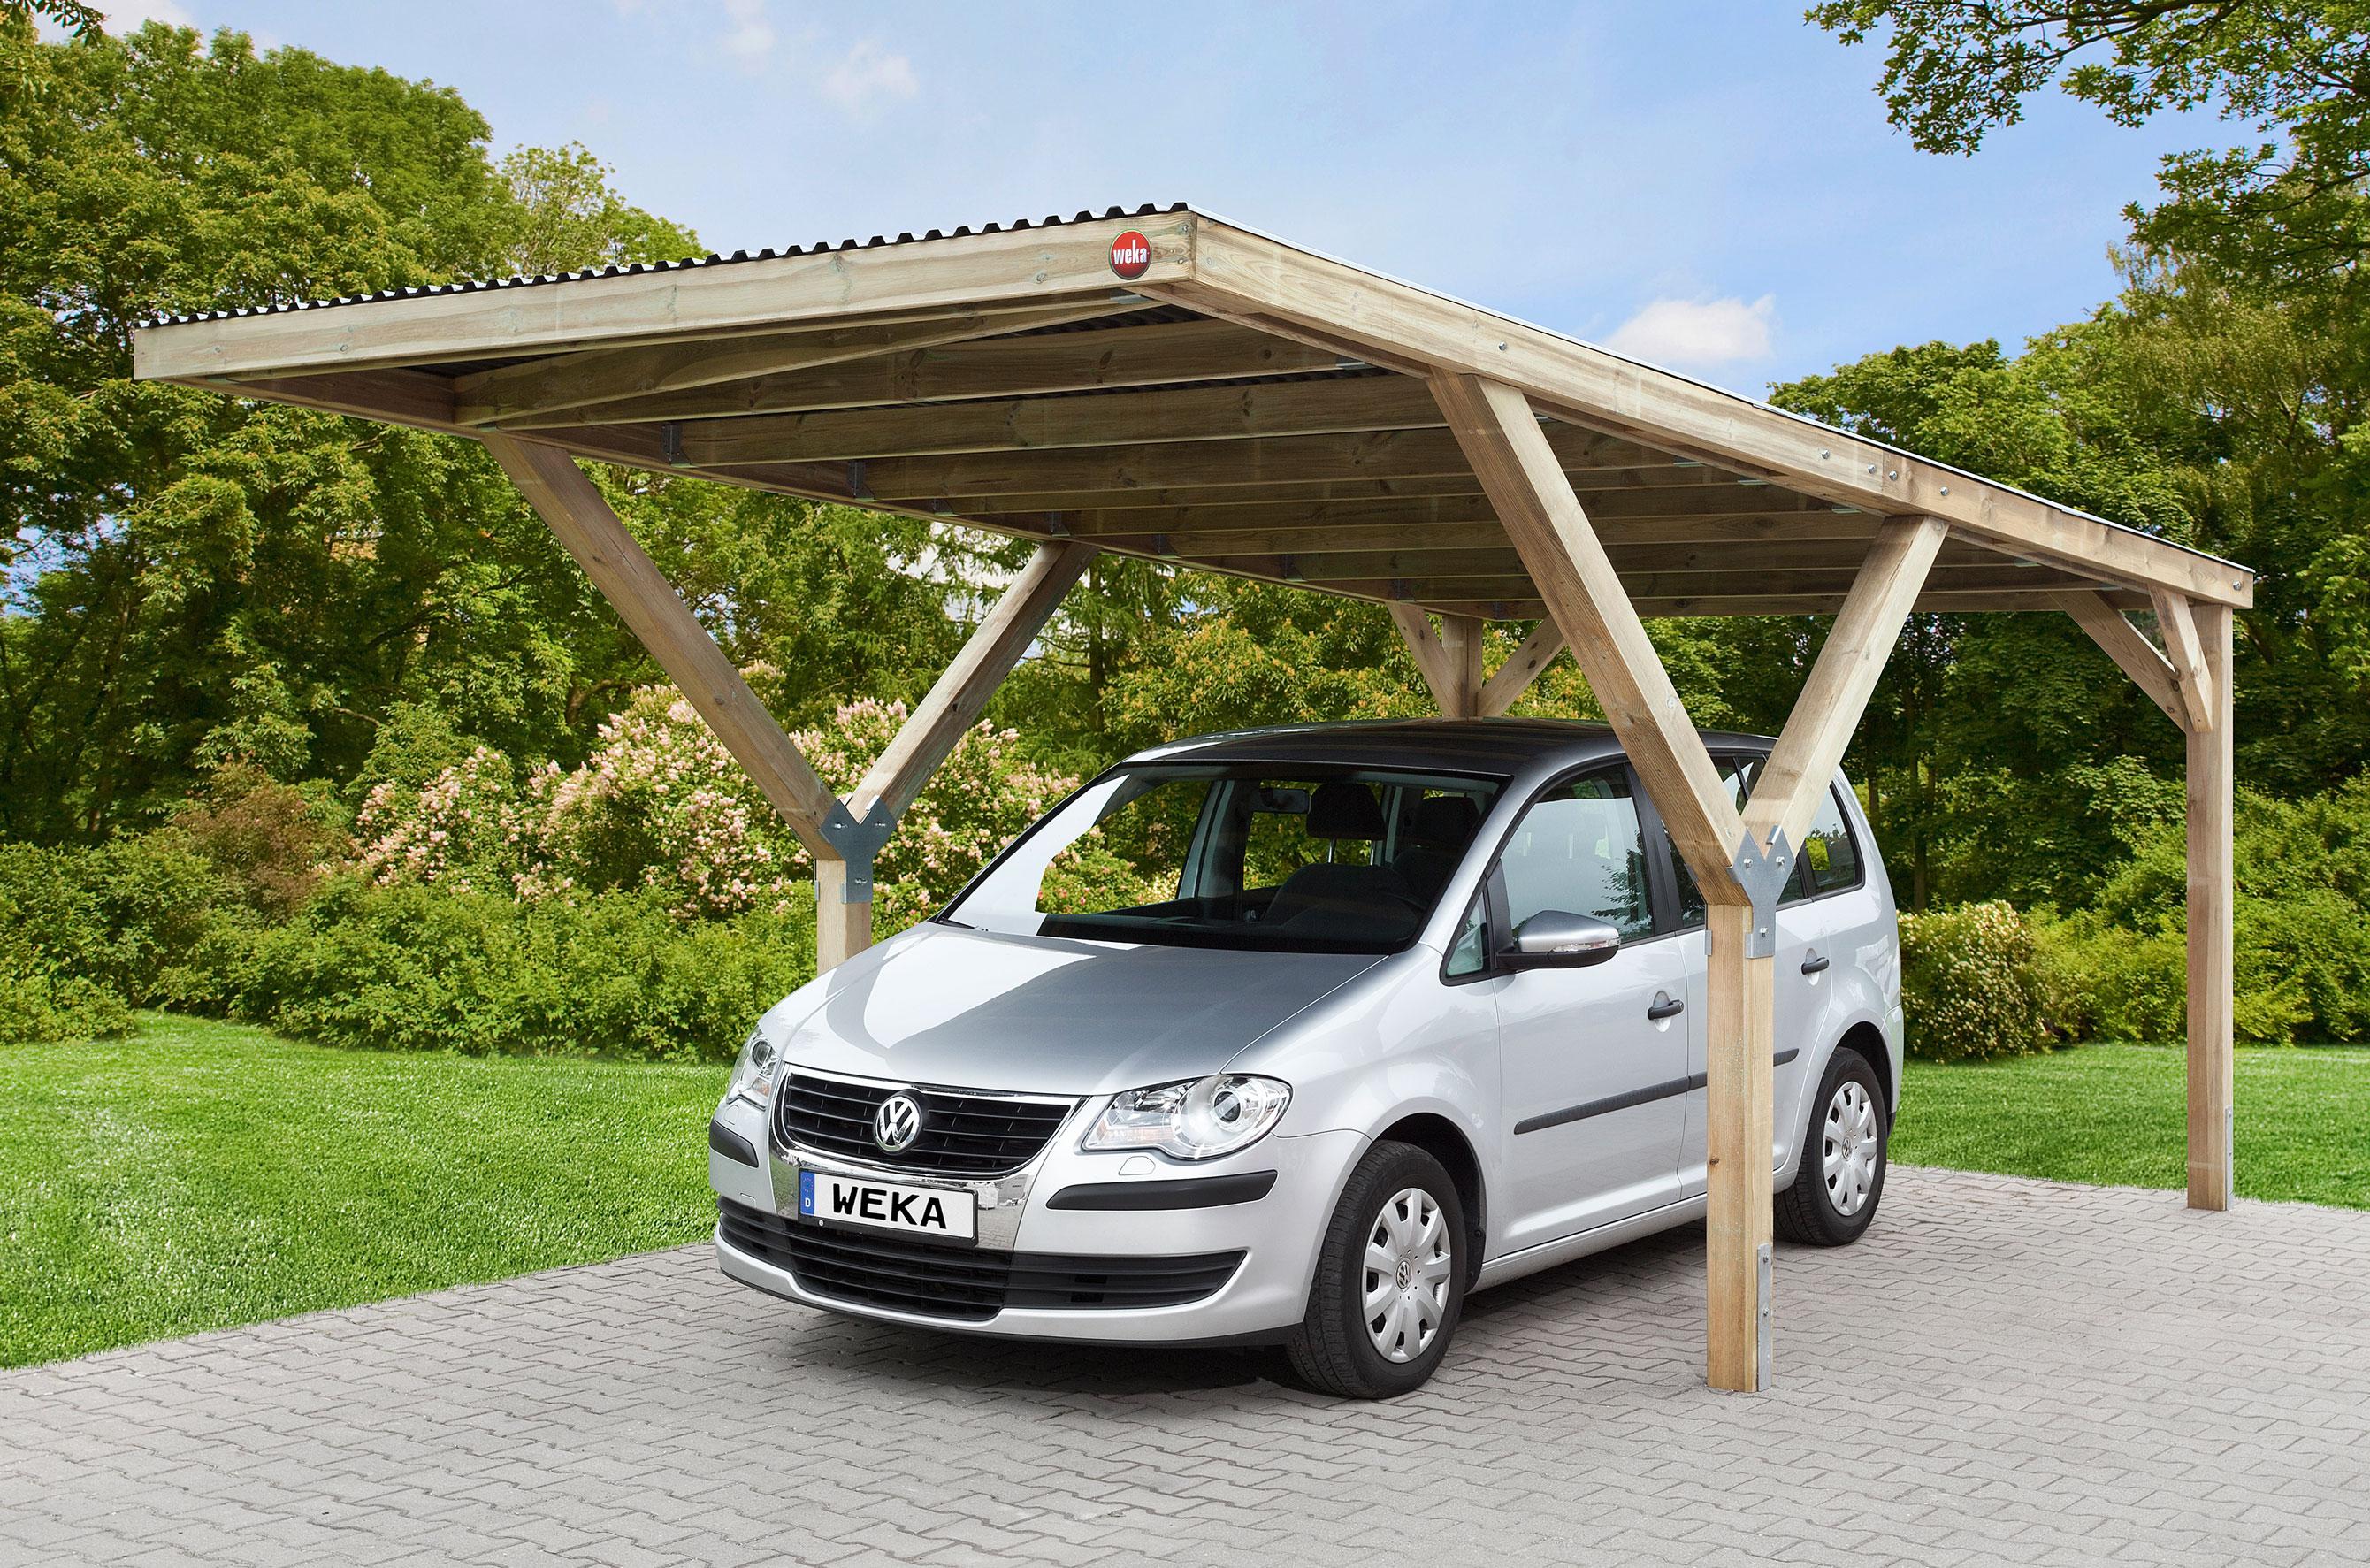 carport weka y carport 612 kdi mit stahldach 306x606cm. Black Bedroom Furniture Sets. Home Design Ideas